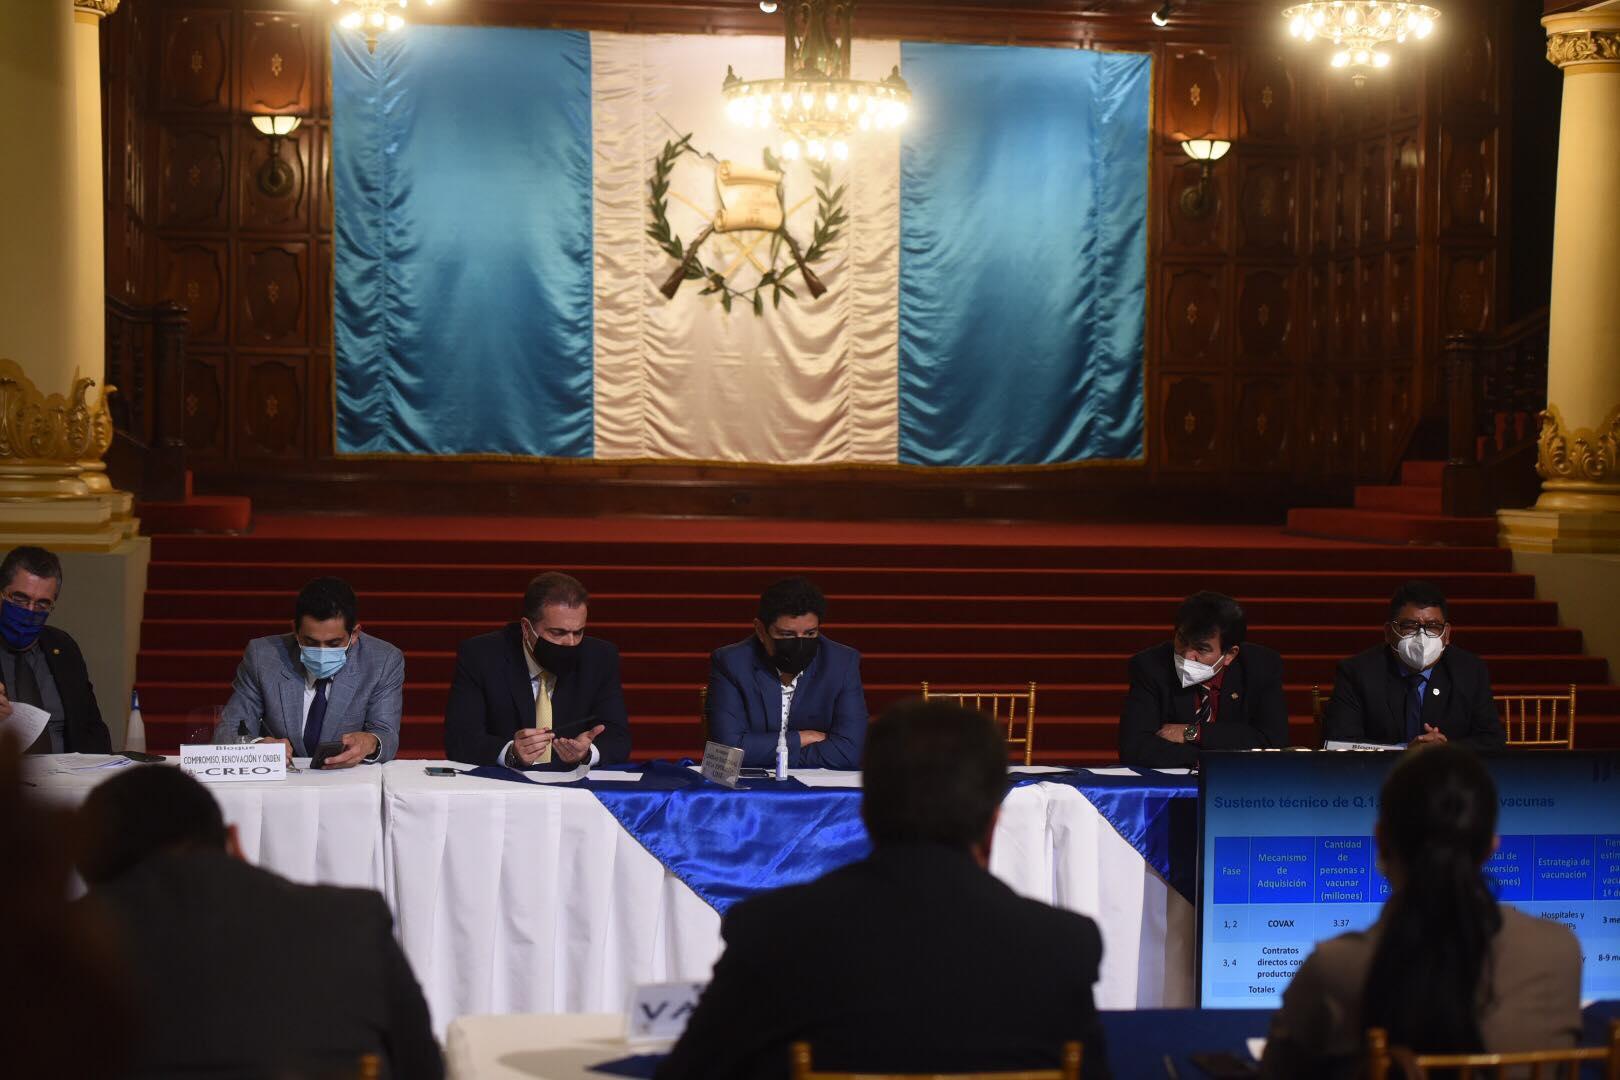 reunión del presidente Alejandro Giammattei con diputados por vacuna contra Covid-19